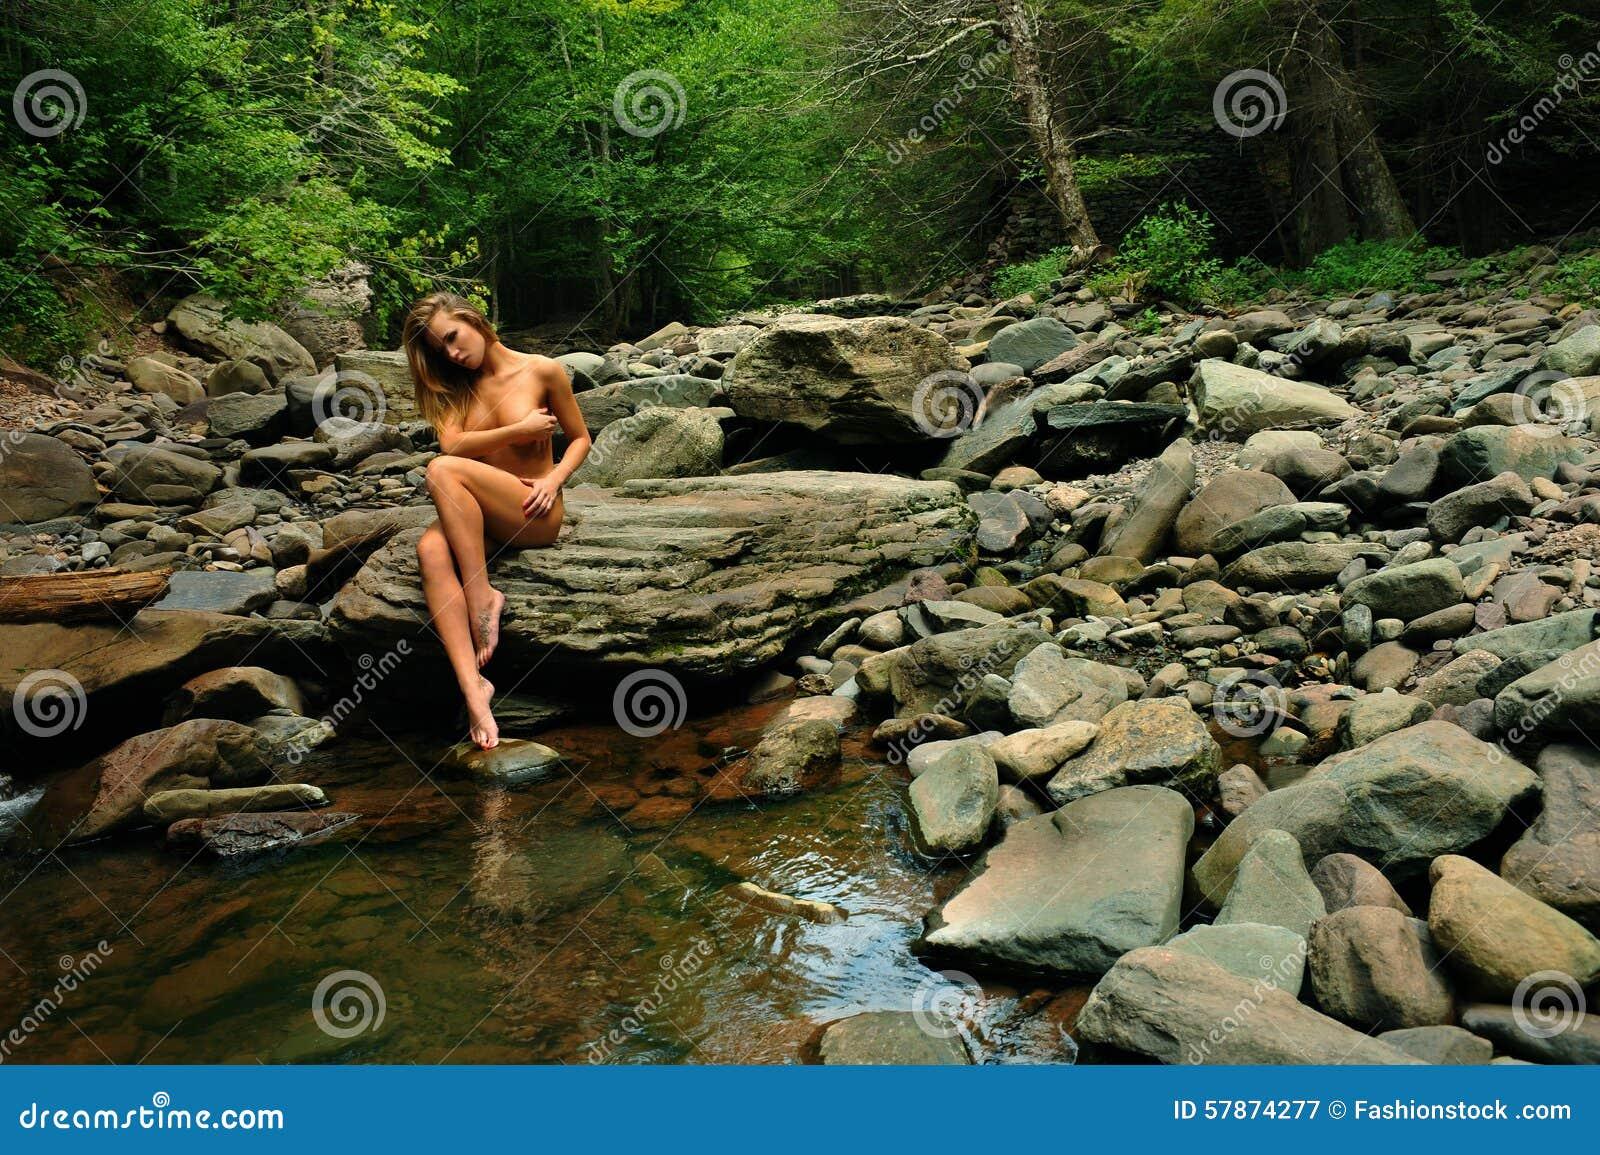 Girls nude mountain wild